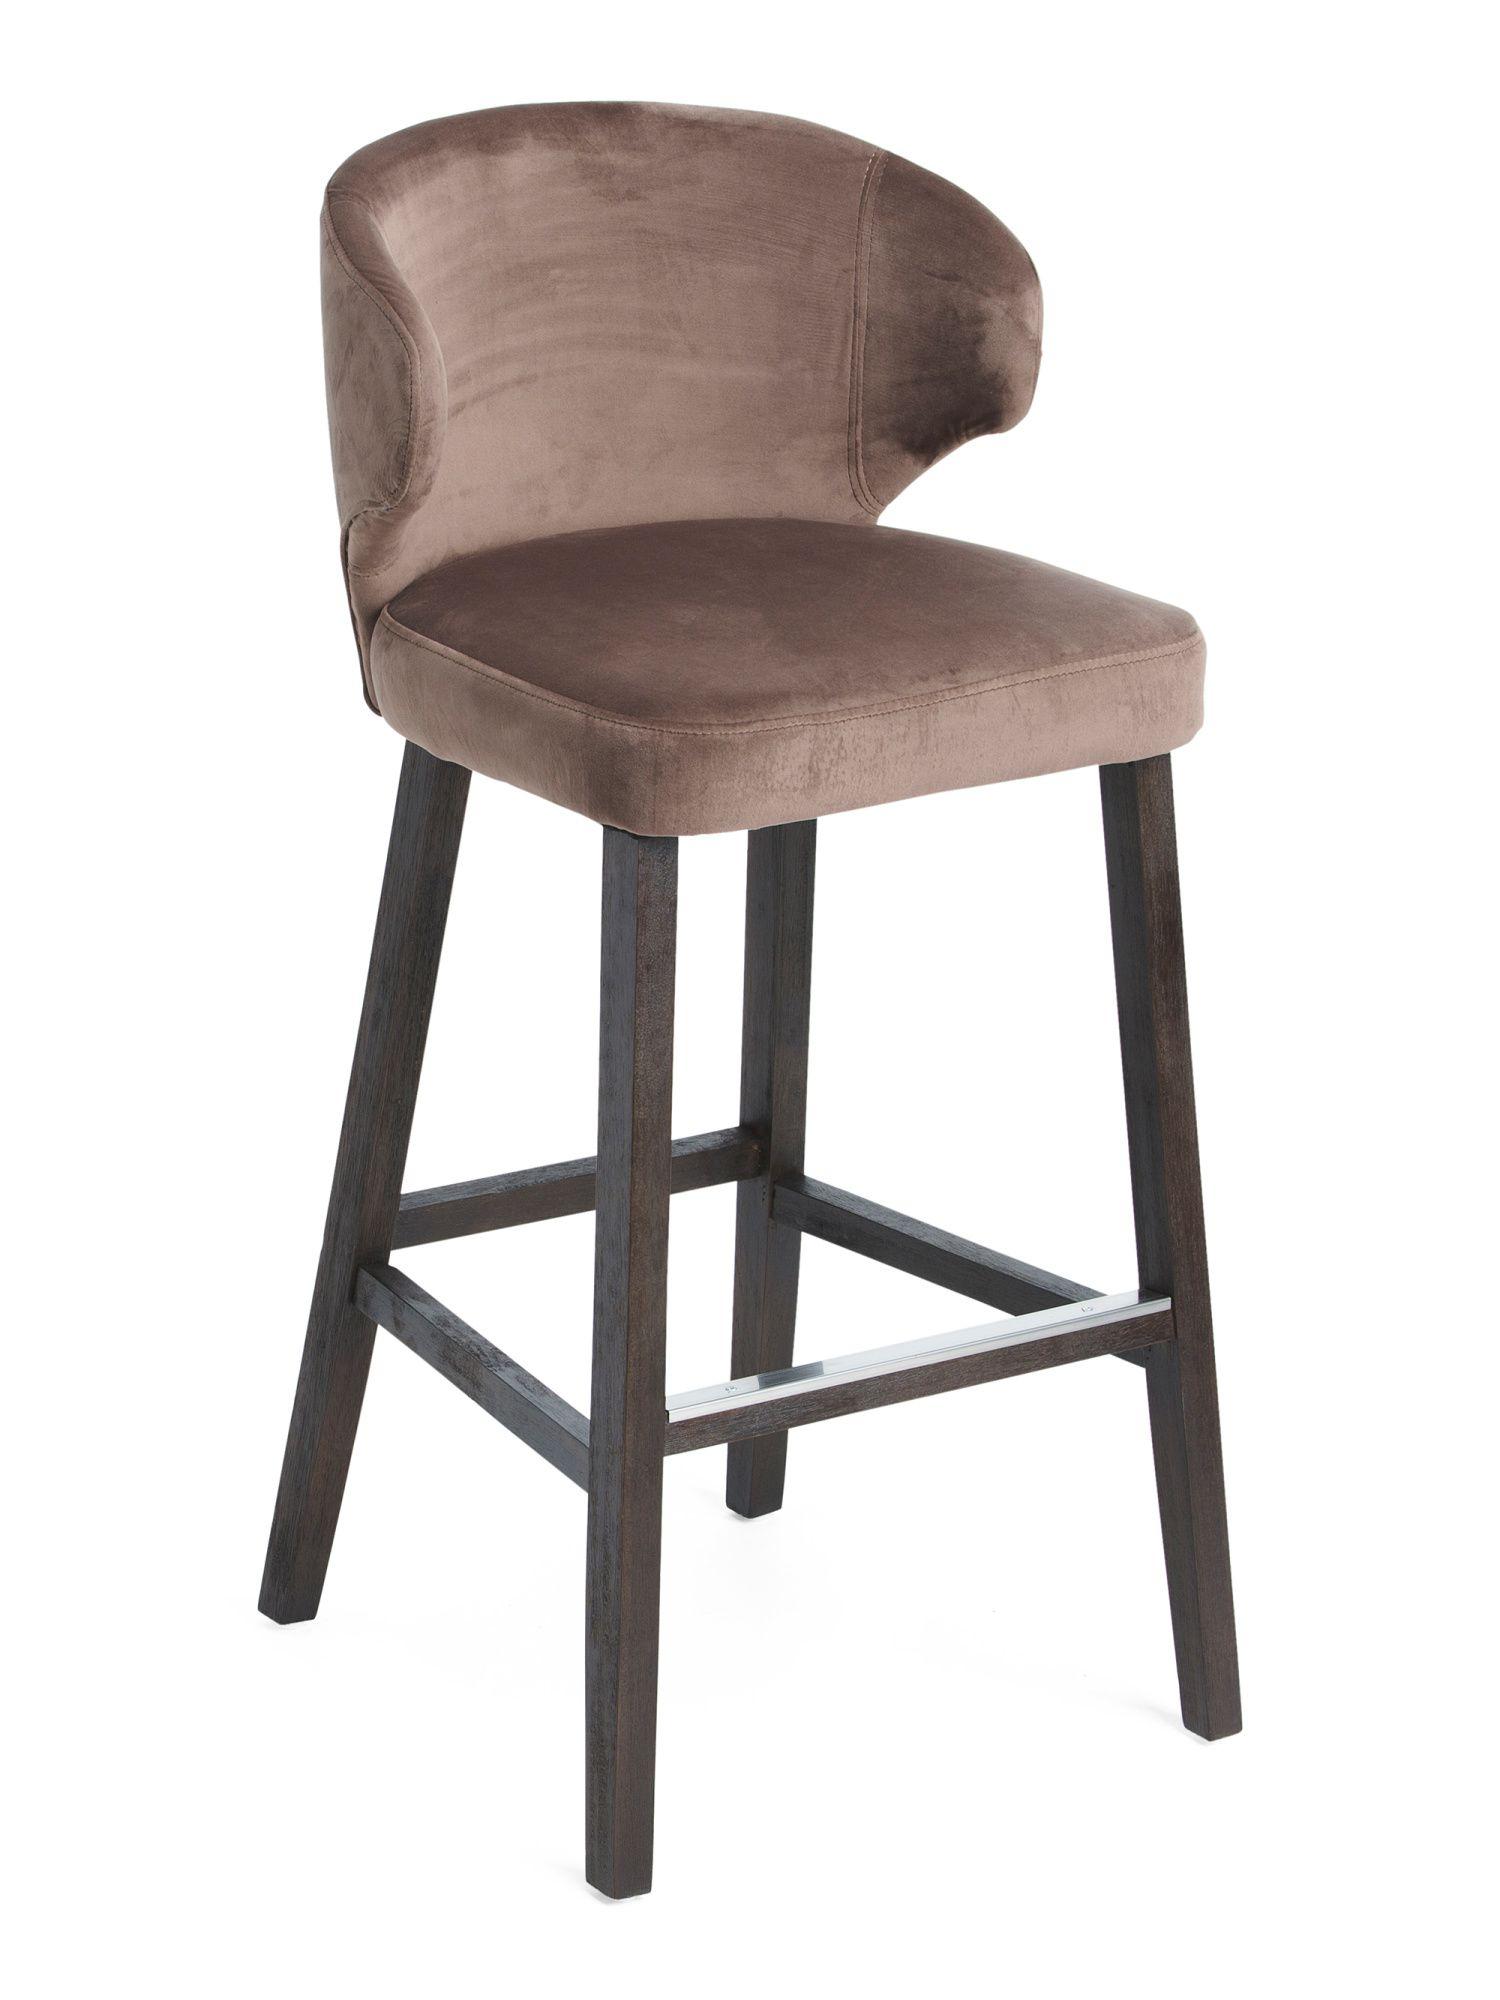 Amazing Carolina Round Back Barstool Home In 2019 Bar Stools Dailytribune Chair Design For Home Dailytribuneorg